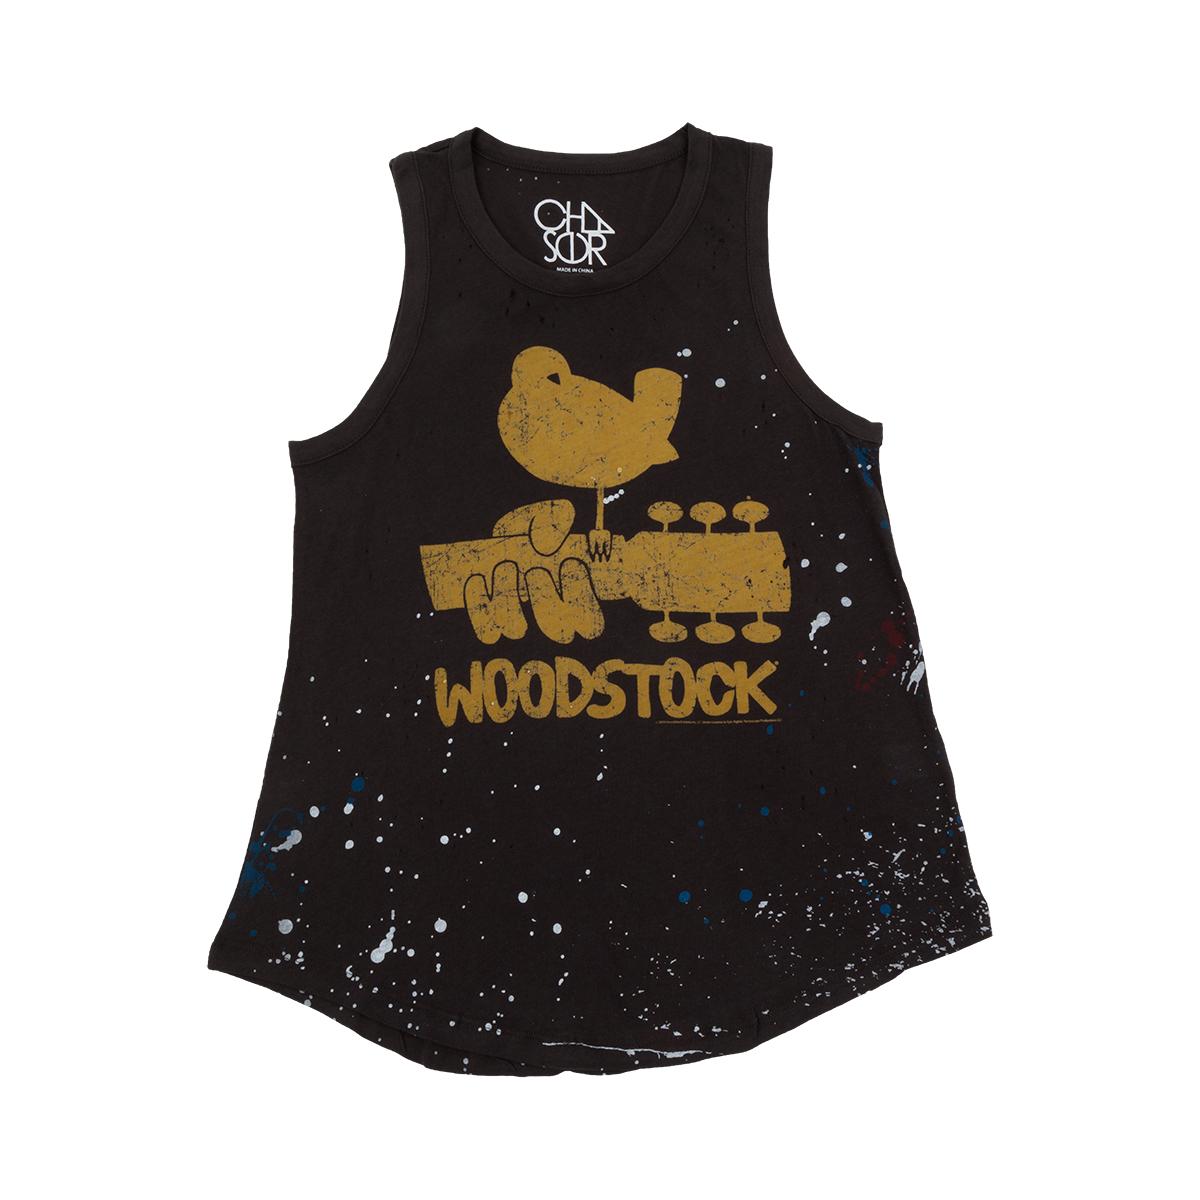 Woodstock Splattered Paint Logo Distressed Tank Top